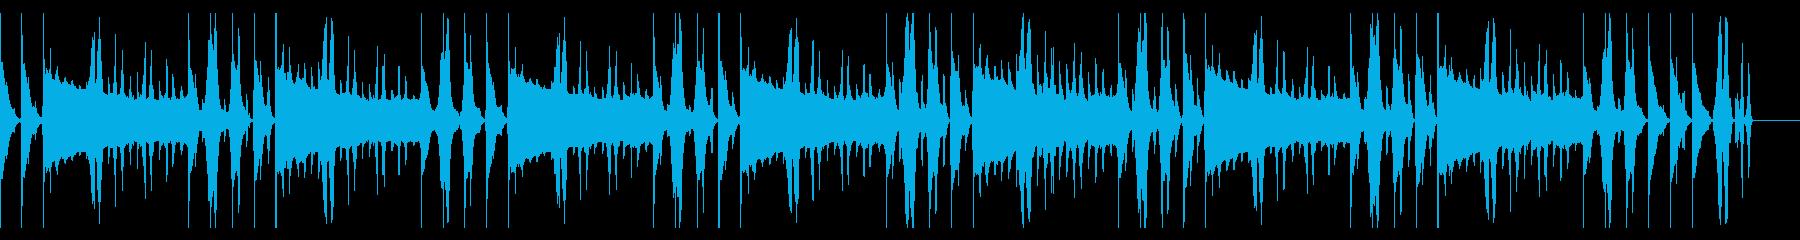 114 BPMの再生済みの波形